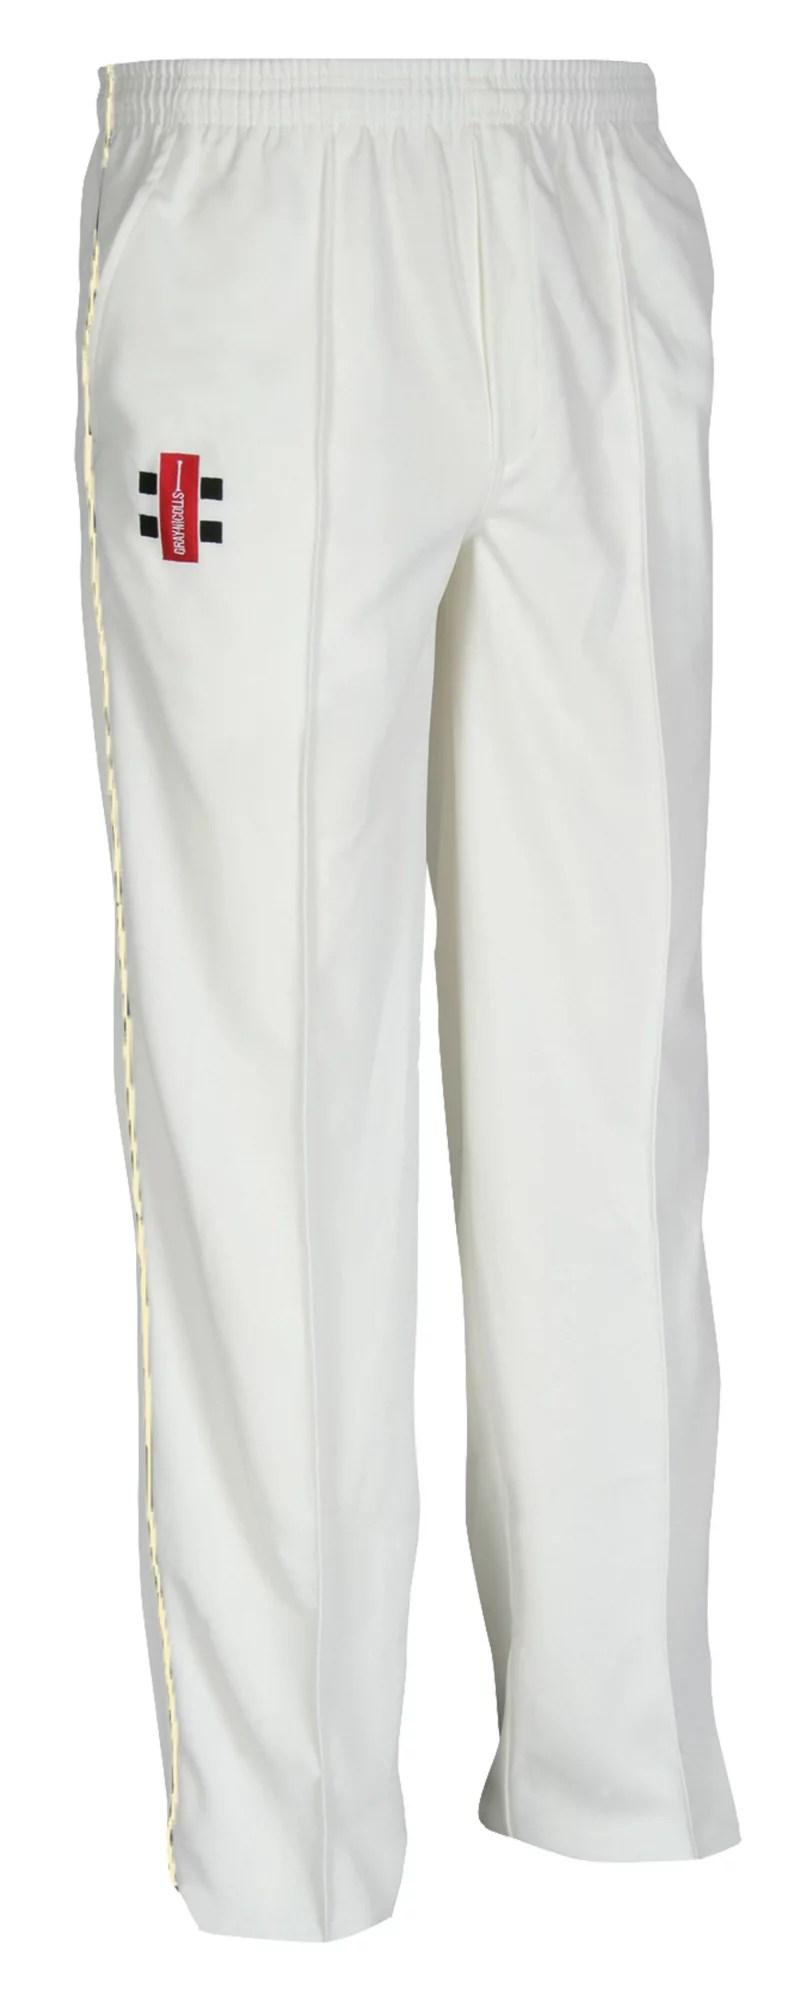 Gray Nicolls Boys' Matrix Cricket Pants | DICK'S Sporting Goods